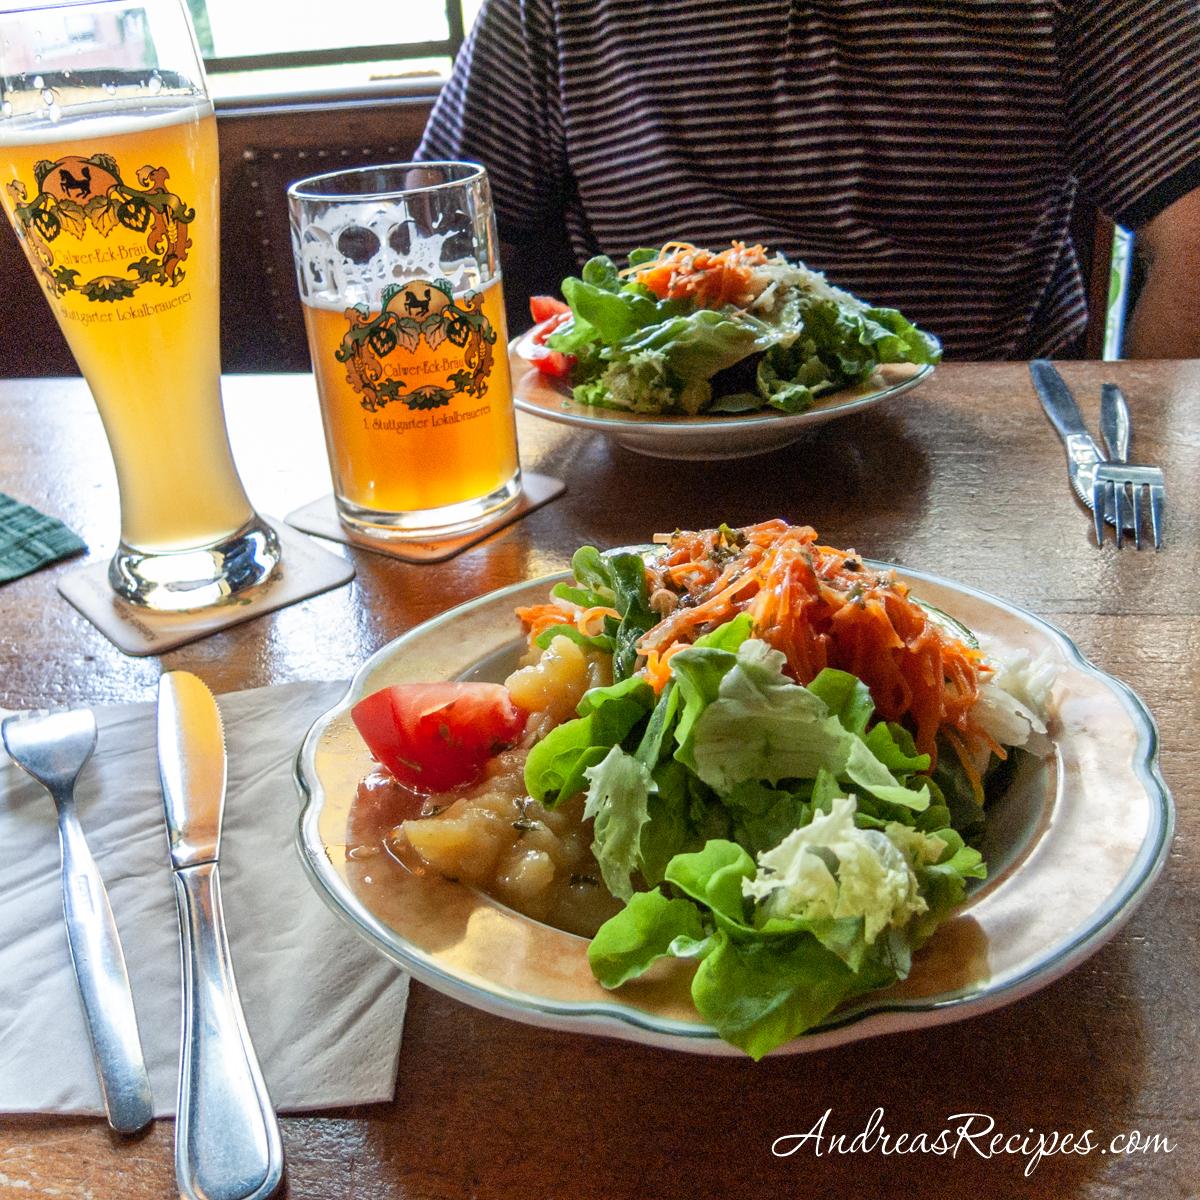 Salads and beer, Calwer Eck, Stuttgart - Andrea Meyers